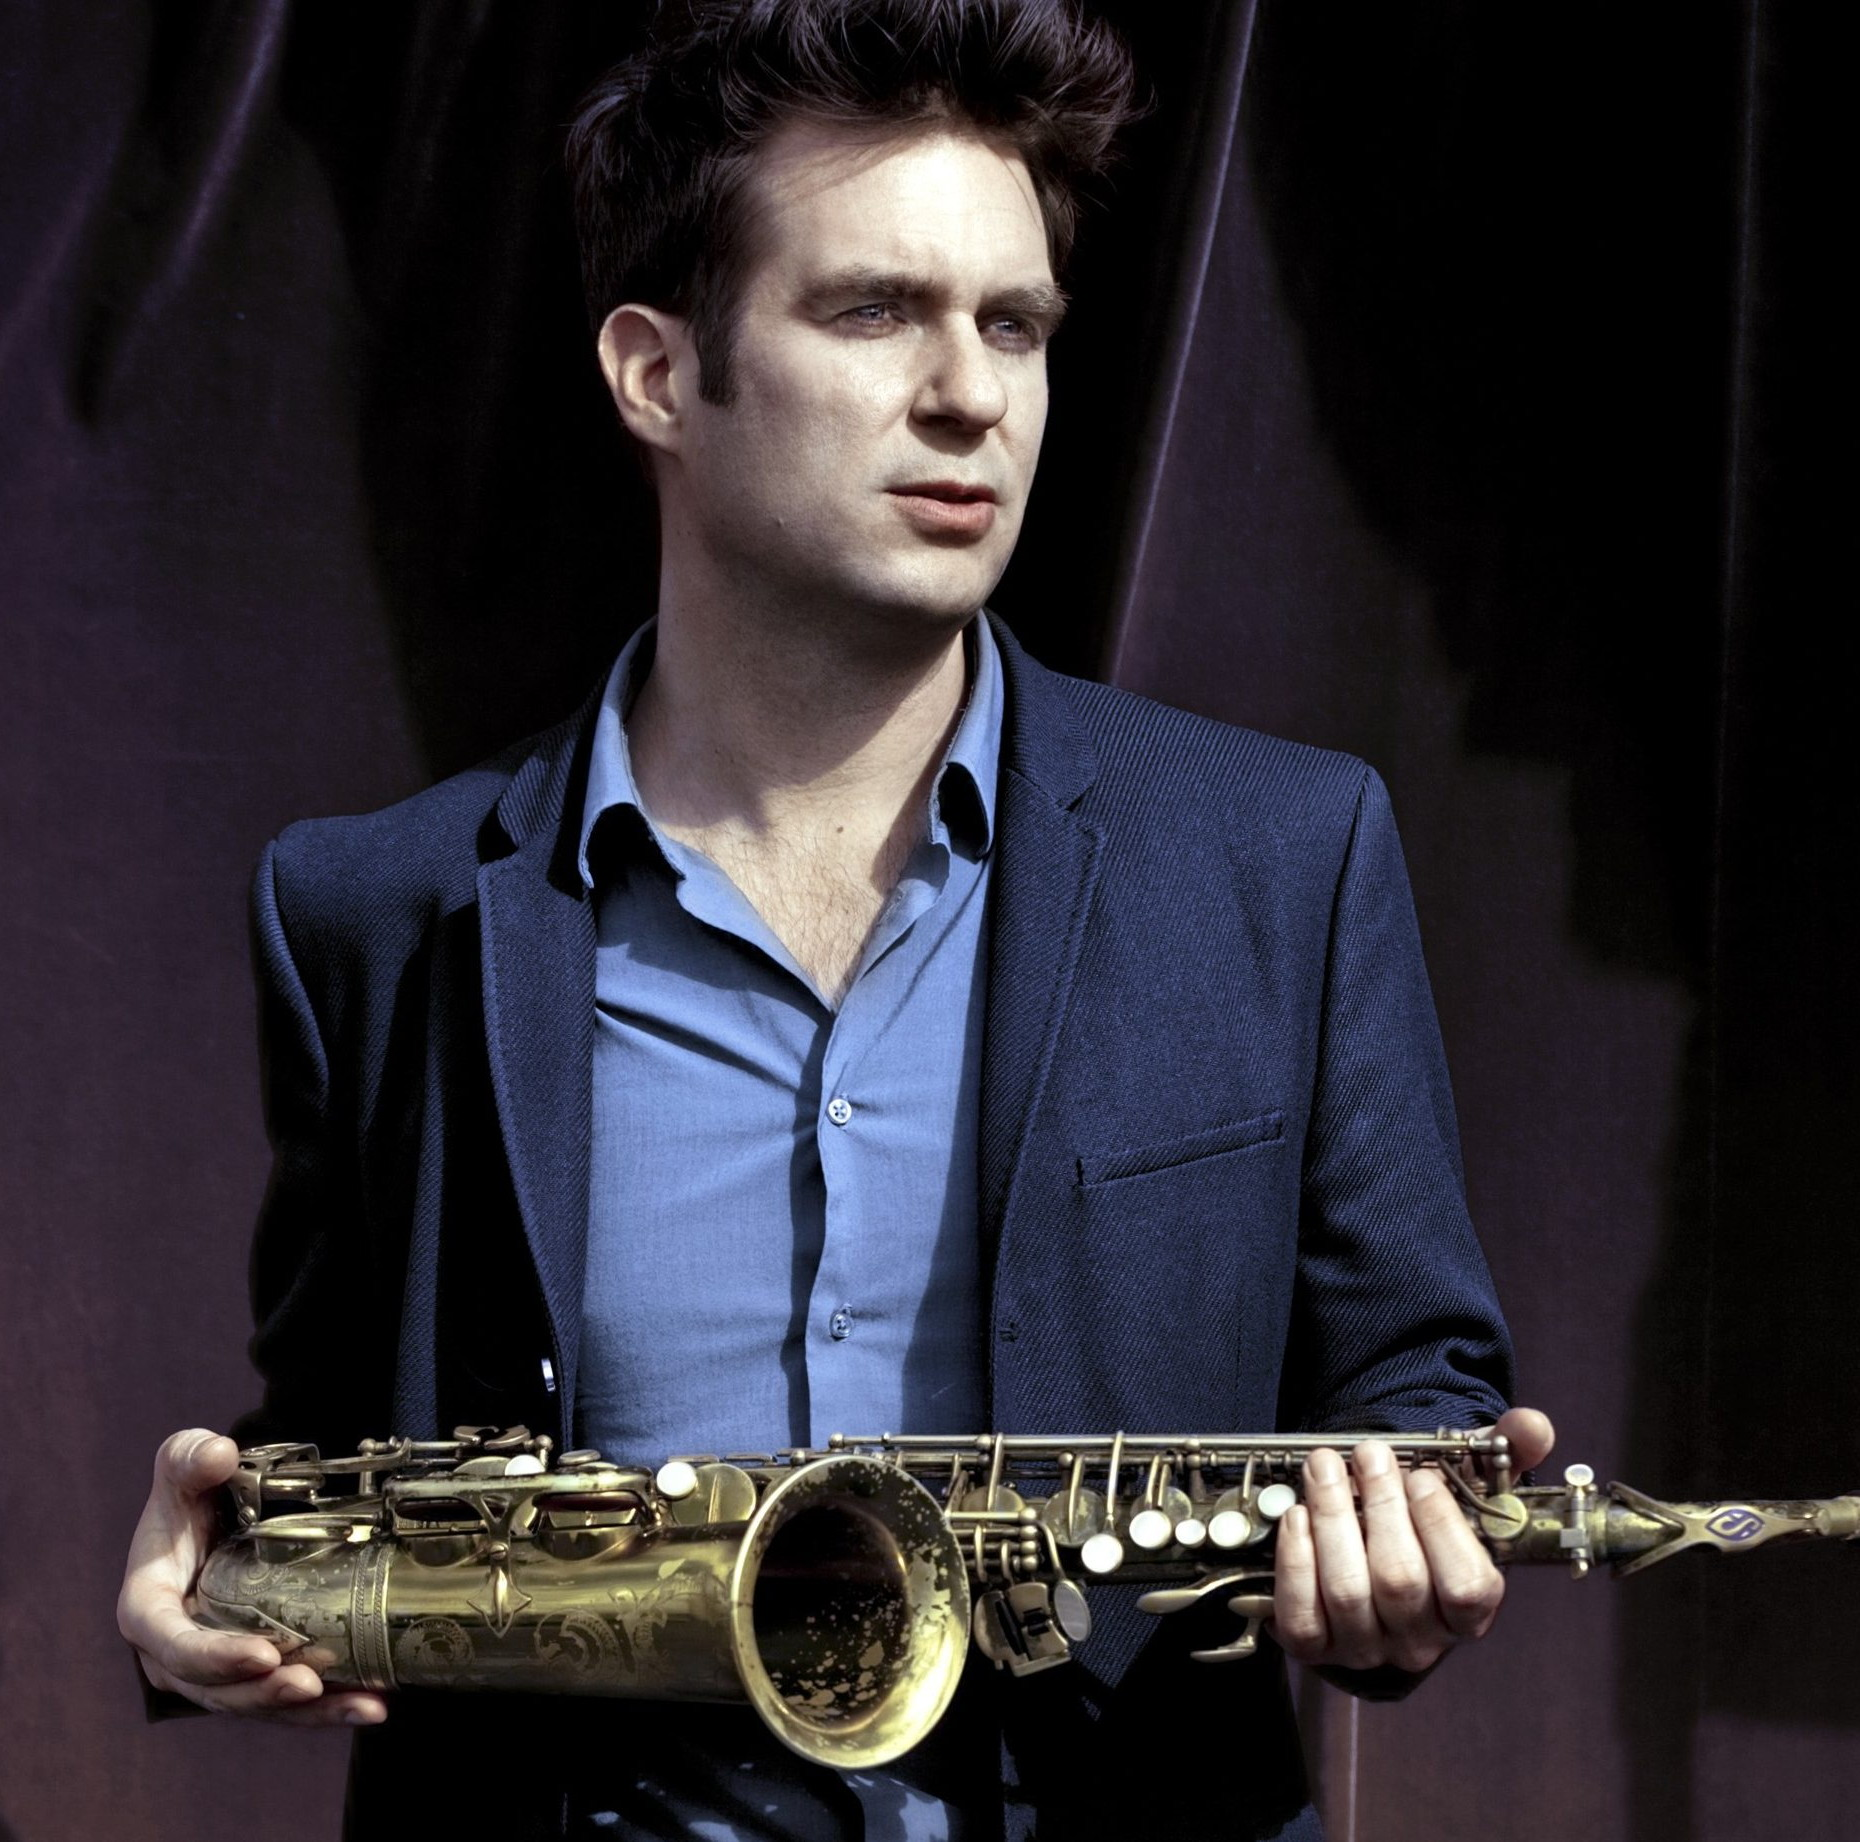 Taste of Jazz met Bart Wirtz